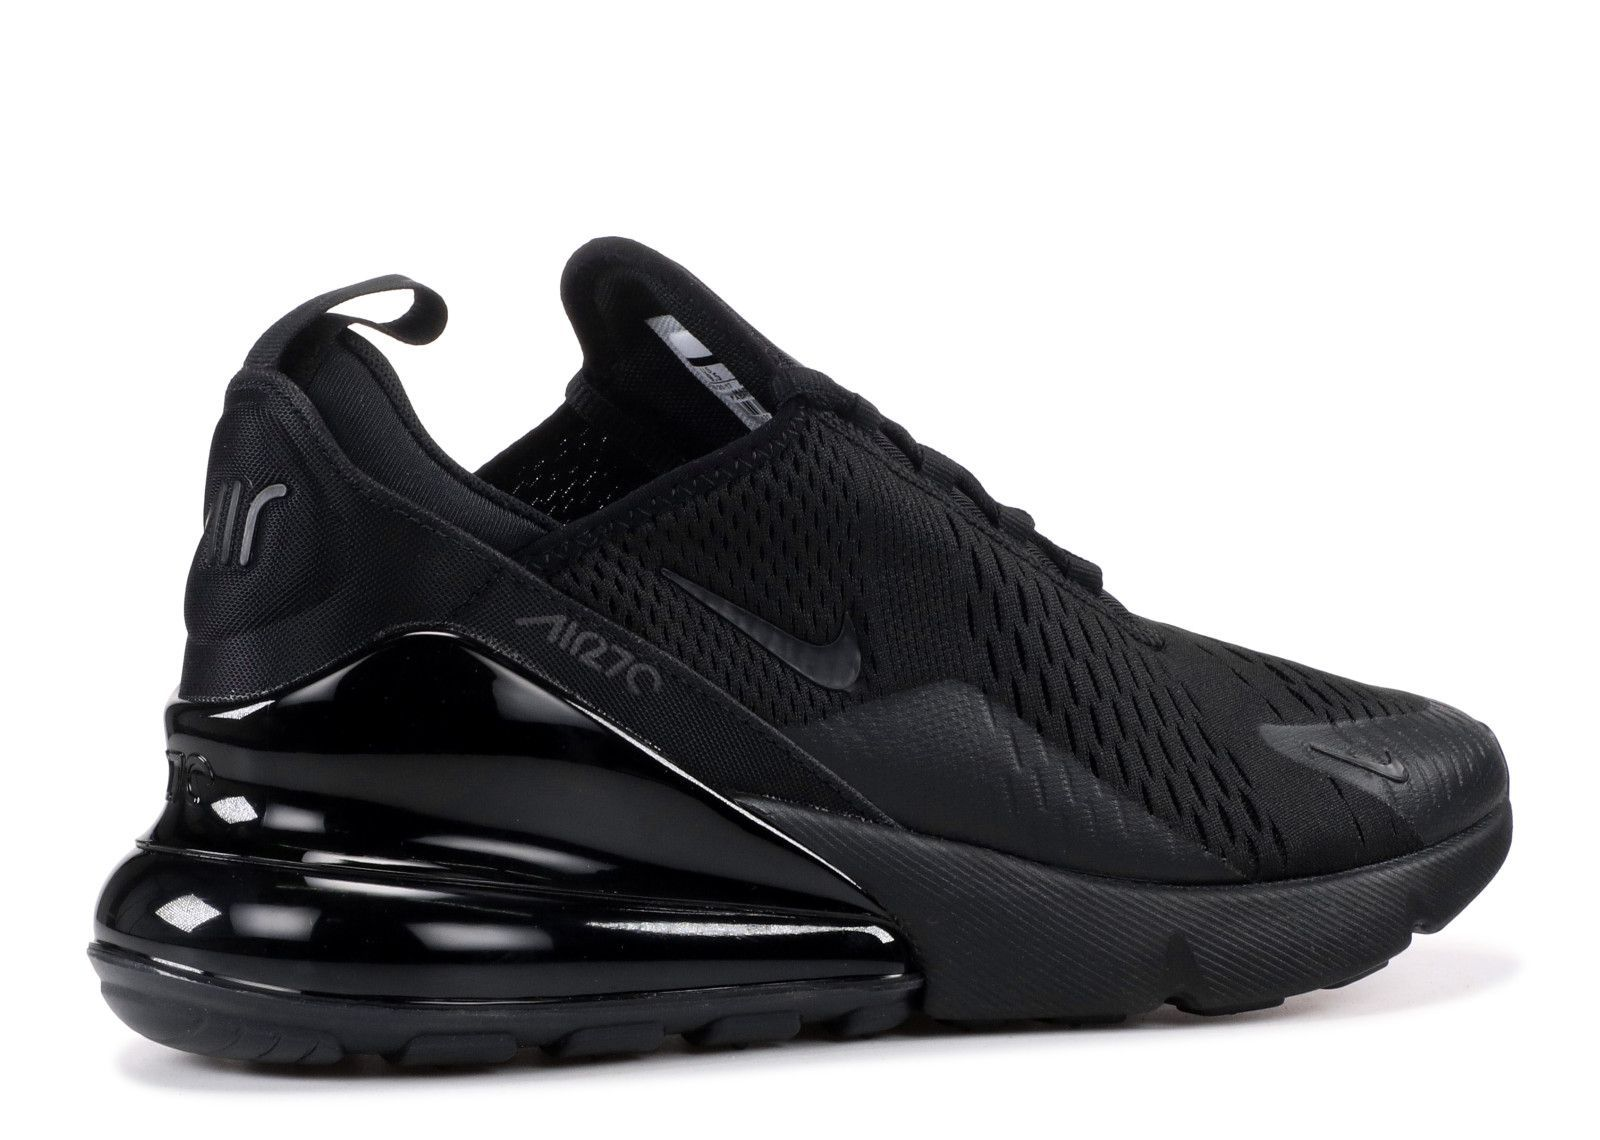 c0af614883 Nike-AIR-27-C-Black-SDL631952343-2-b1d97.jpeg